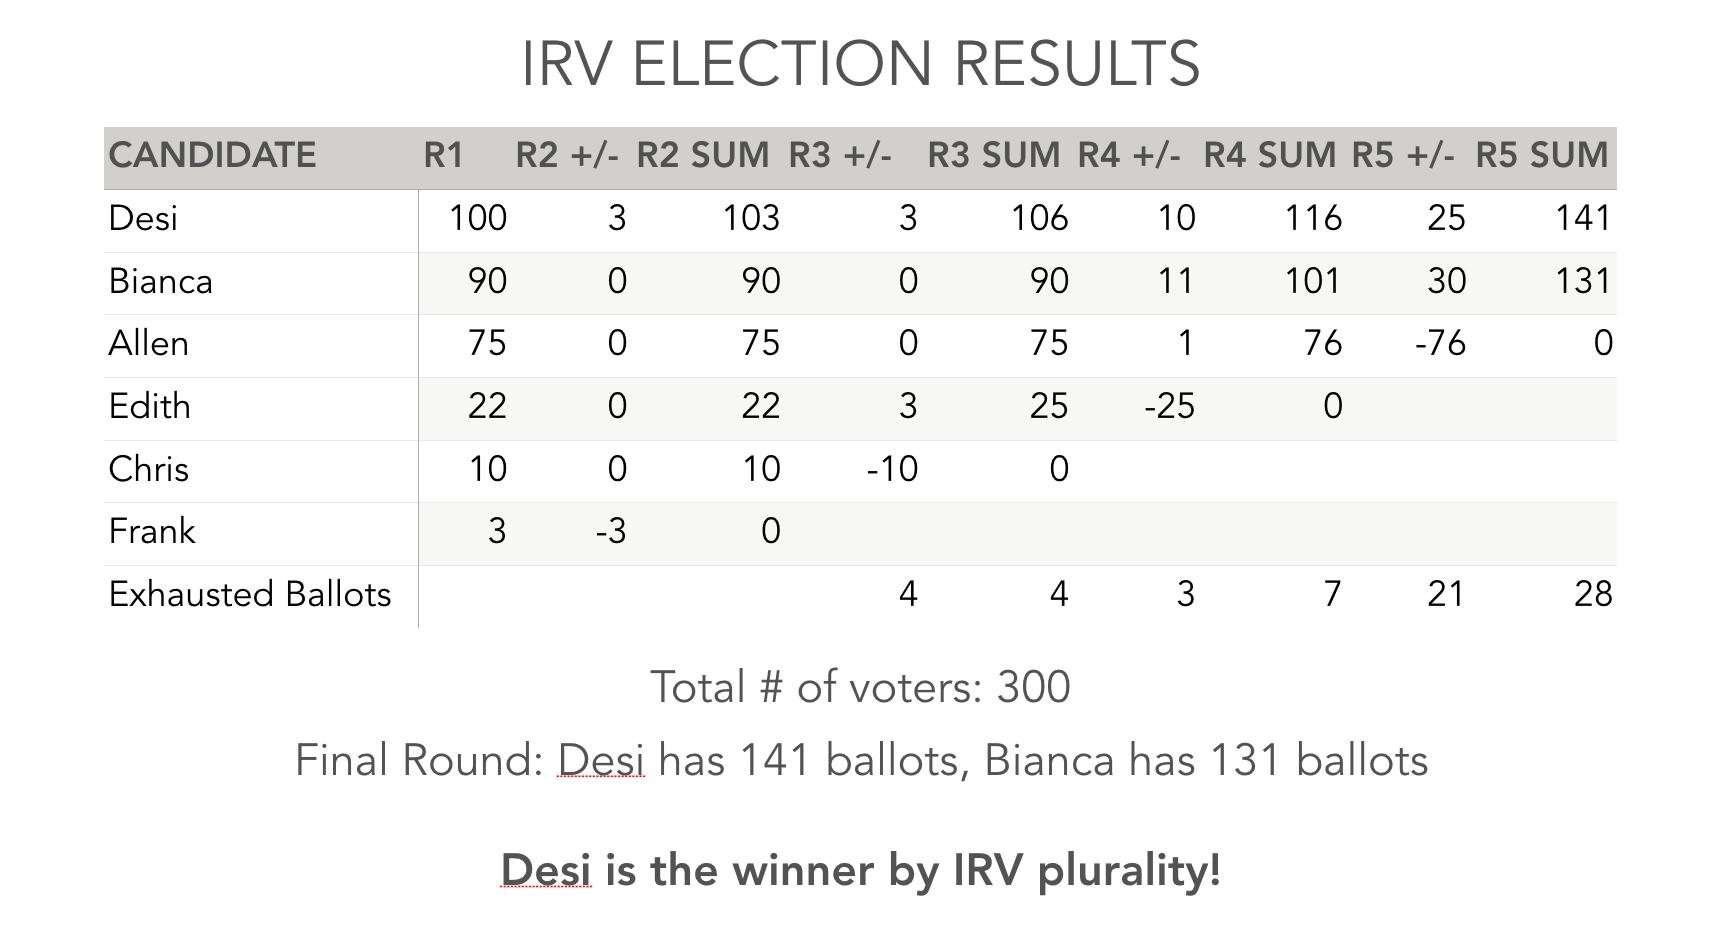 svi_irv_results.png